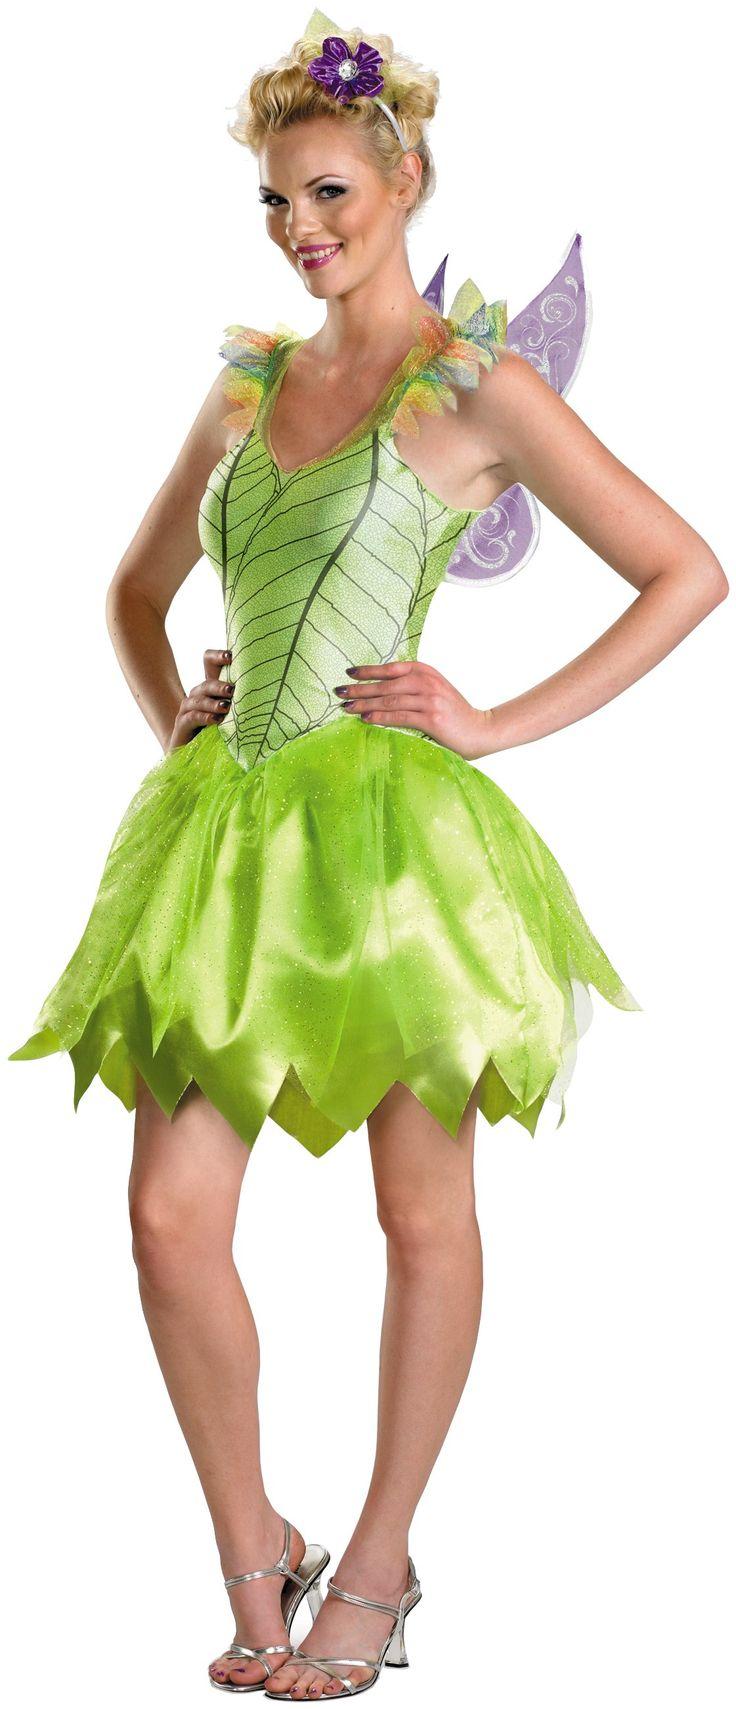 Disney Tinker Bell Rainbow Deluxe Adult Costume 48.99